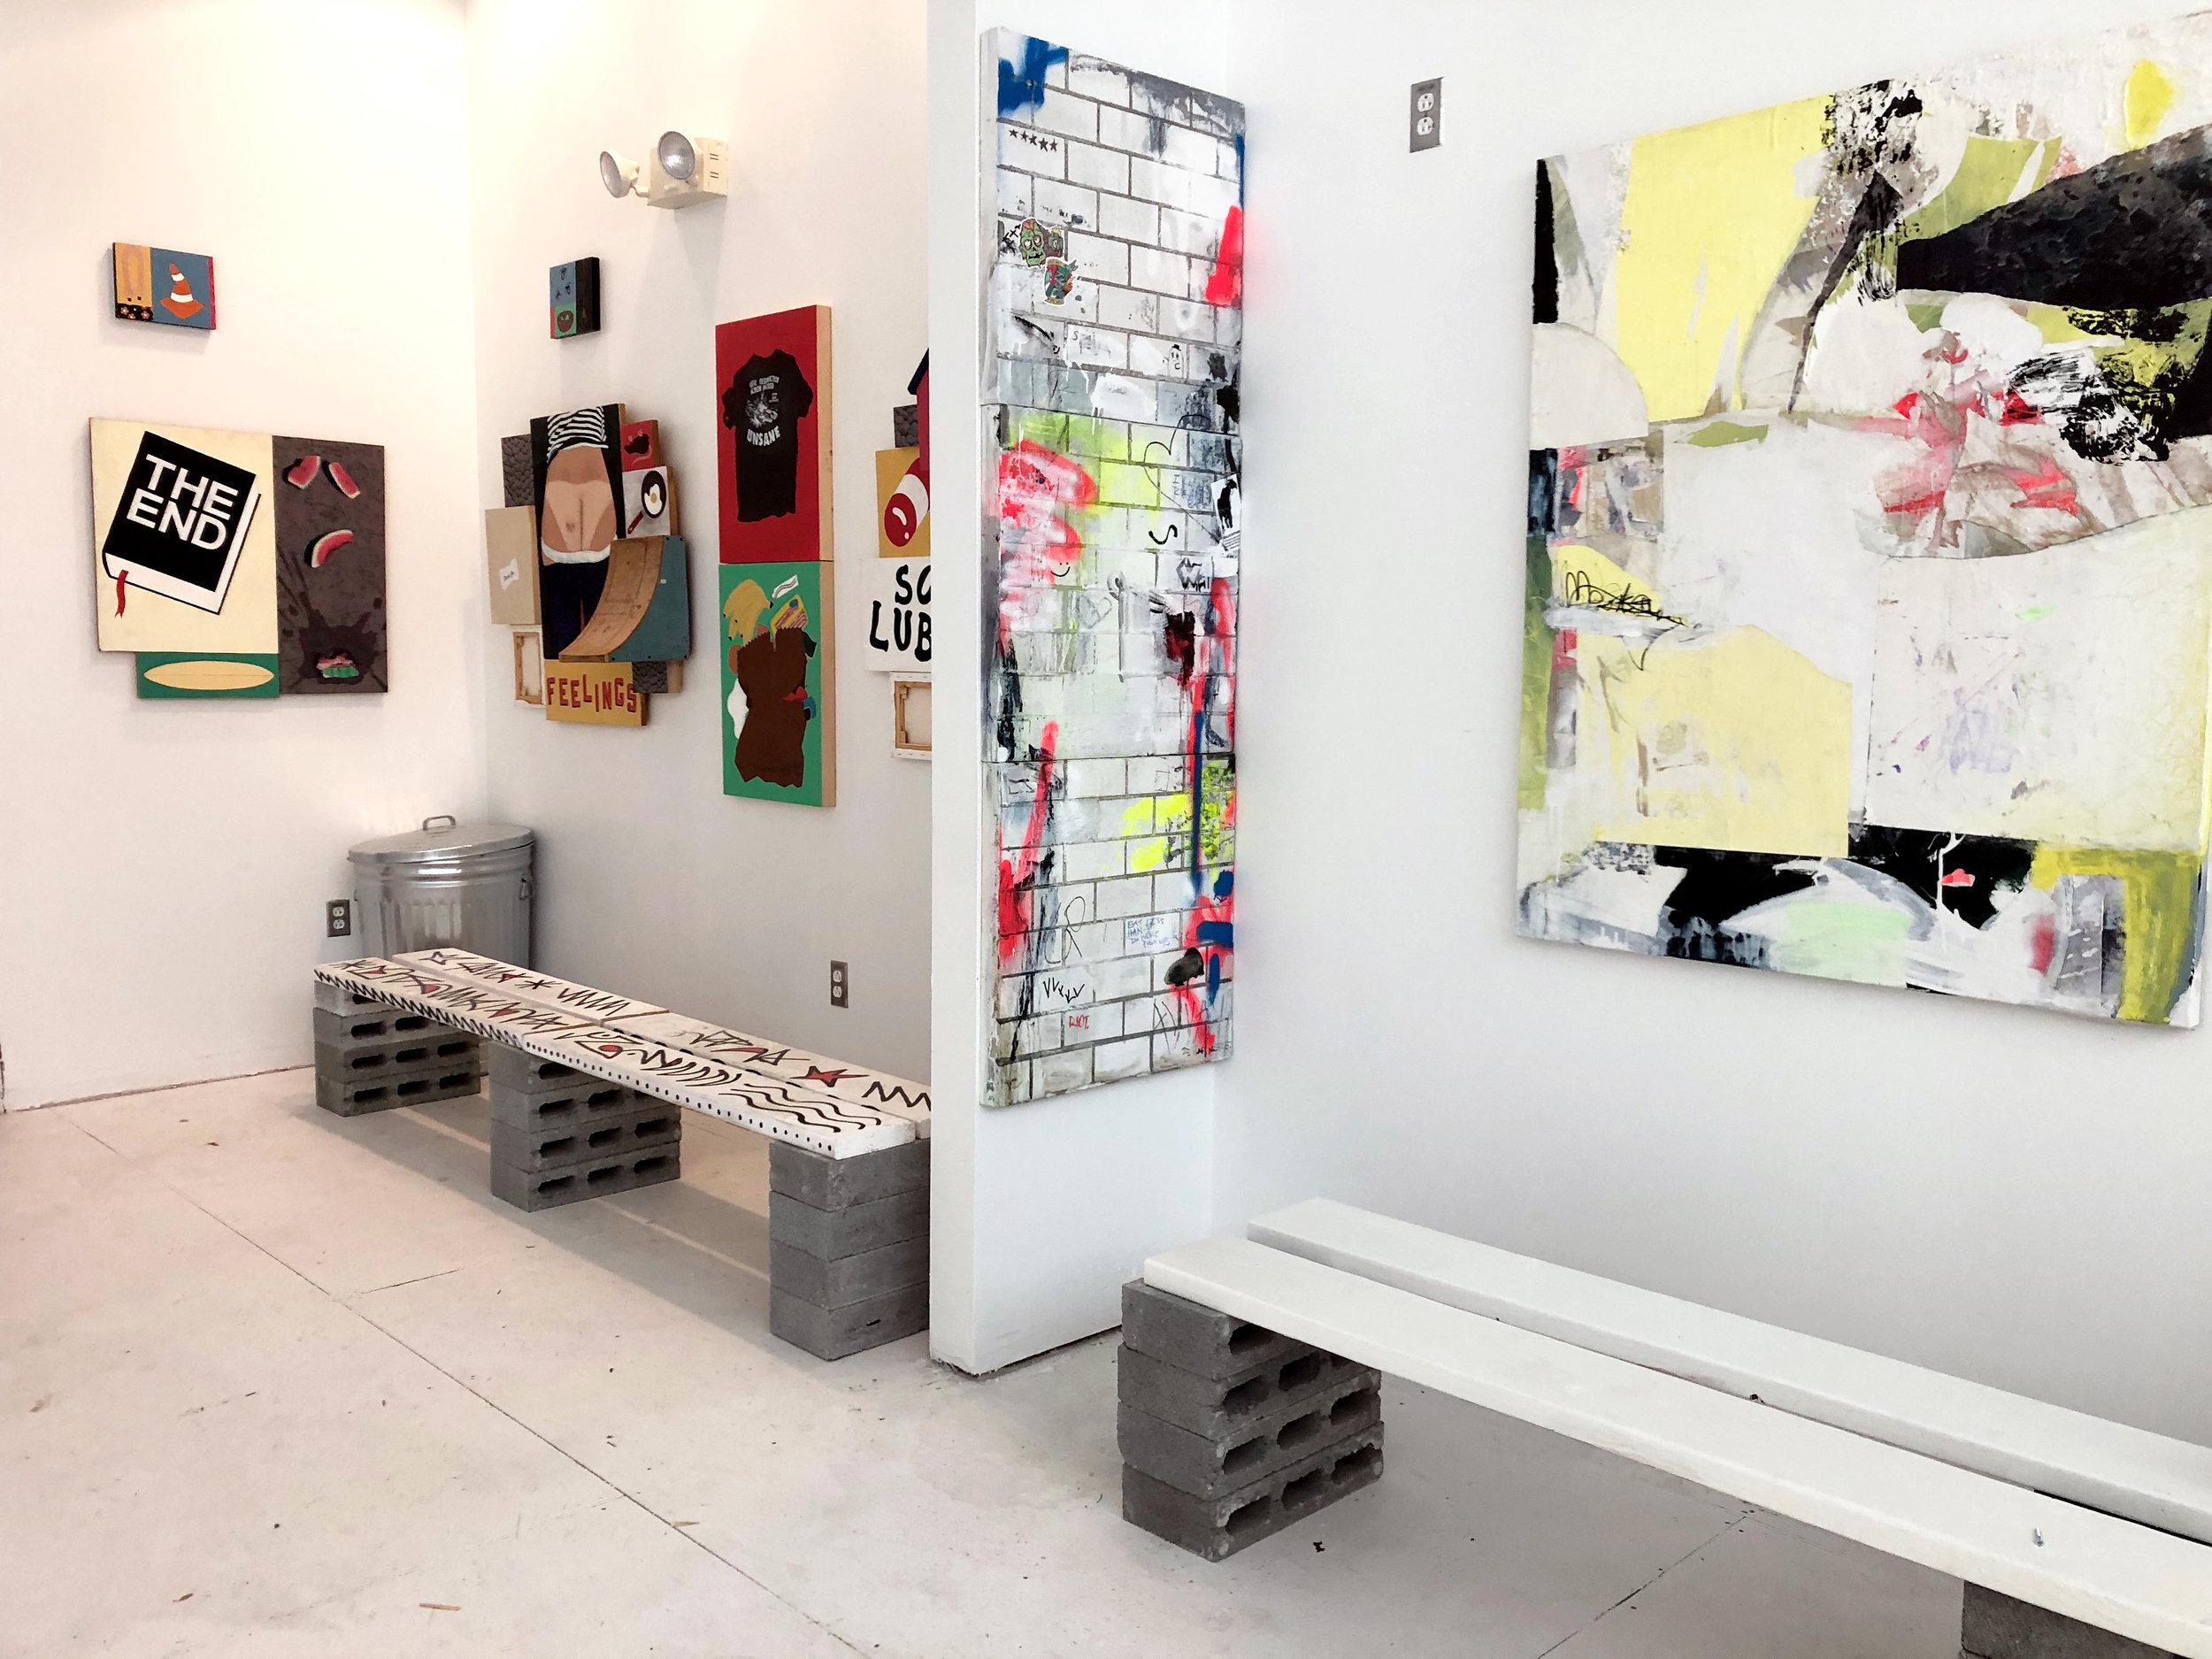 exit_dtx_art_gallery_boston.jpg